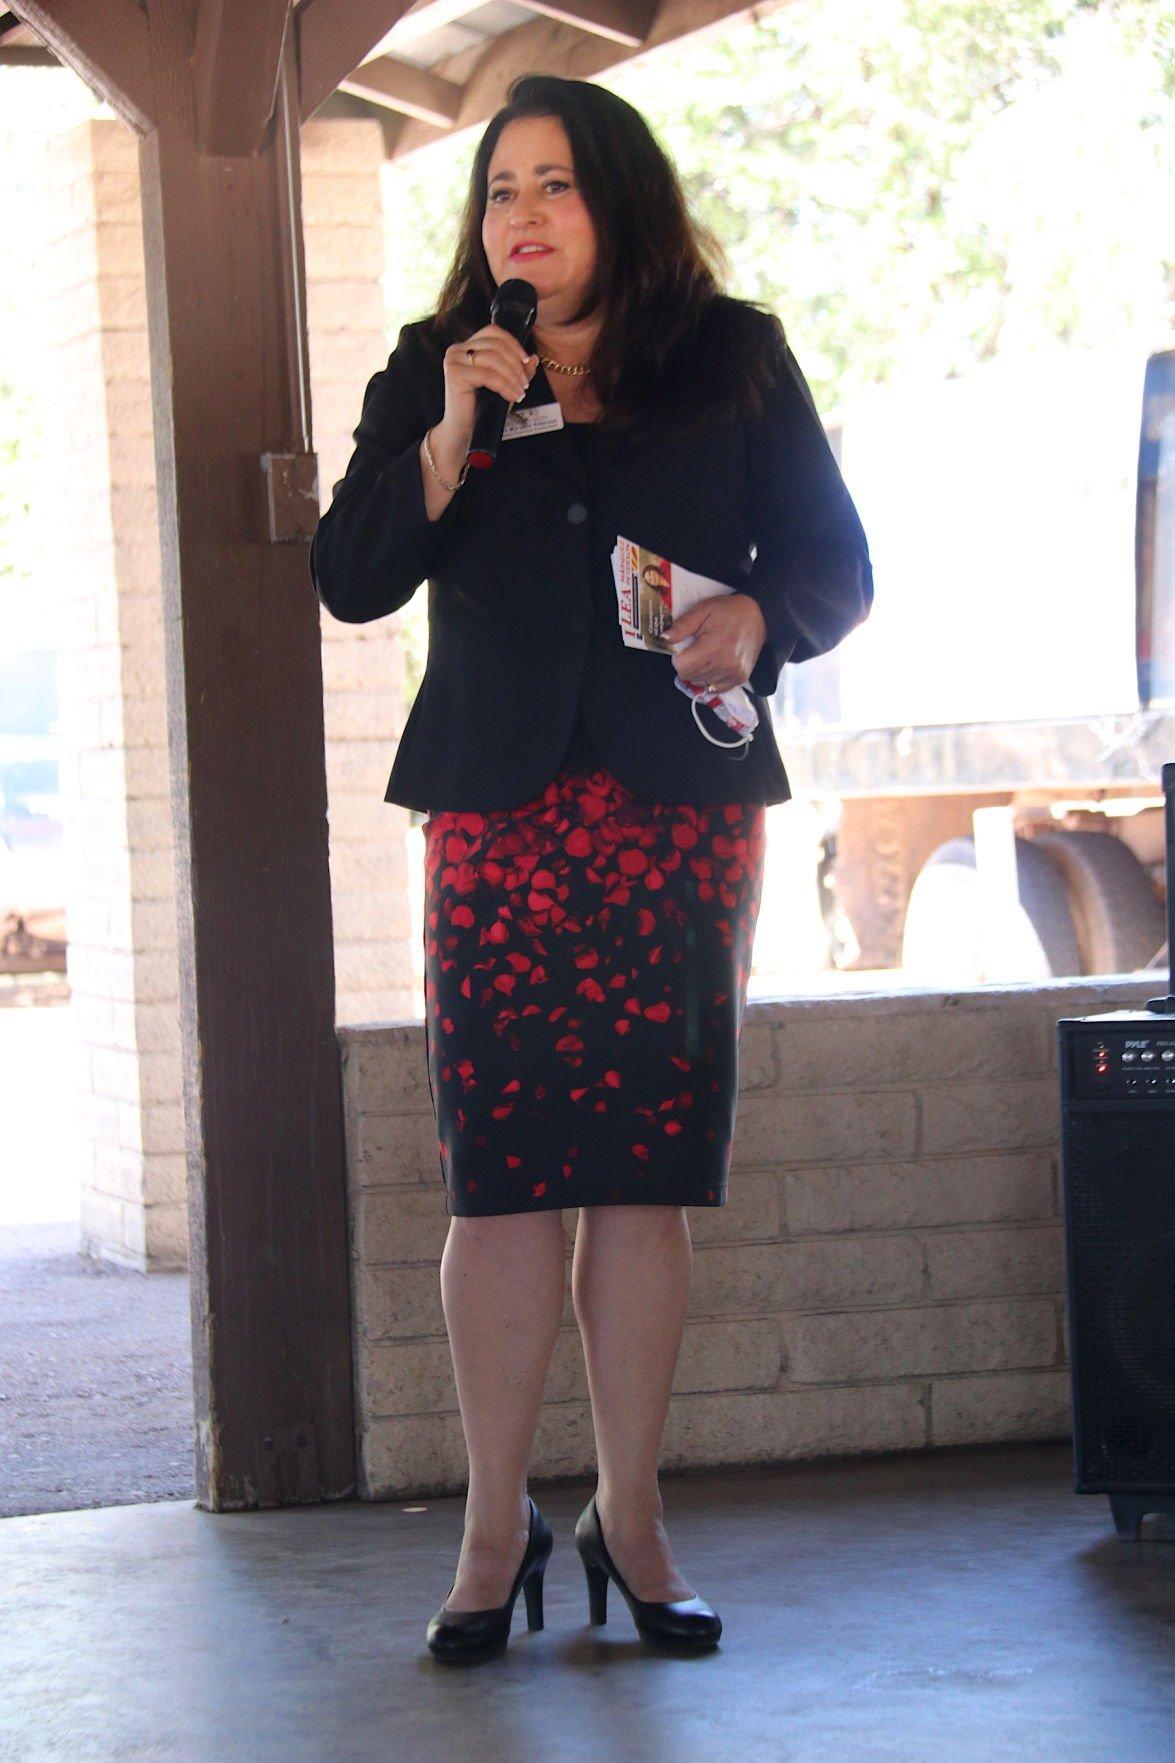 Lea Márquez Peterson head to toe shot speaking